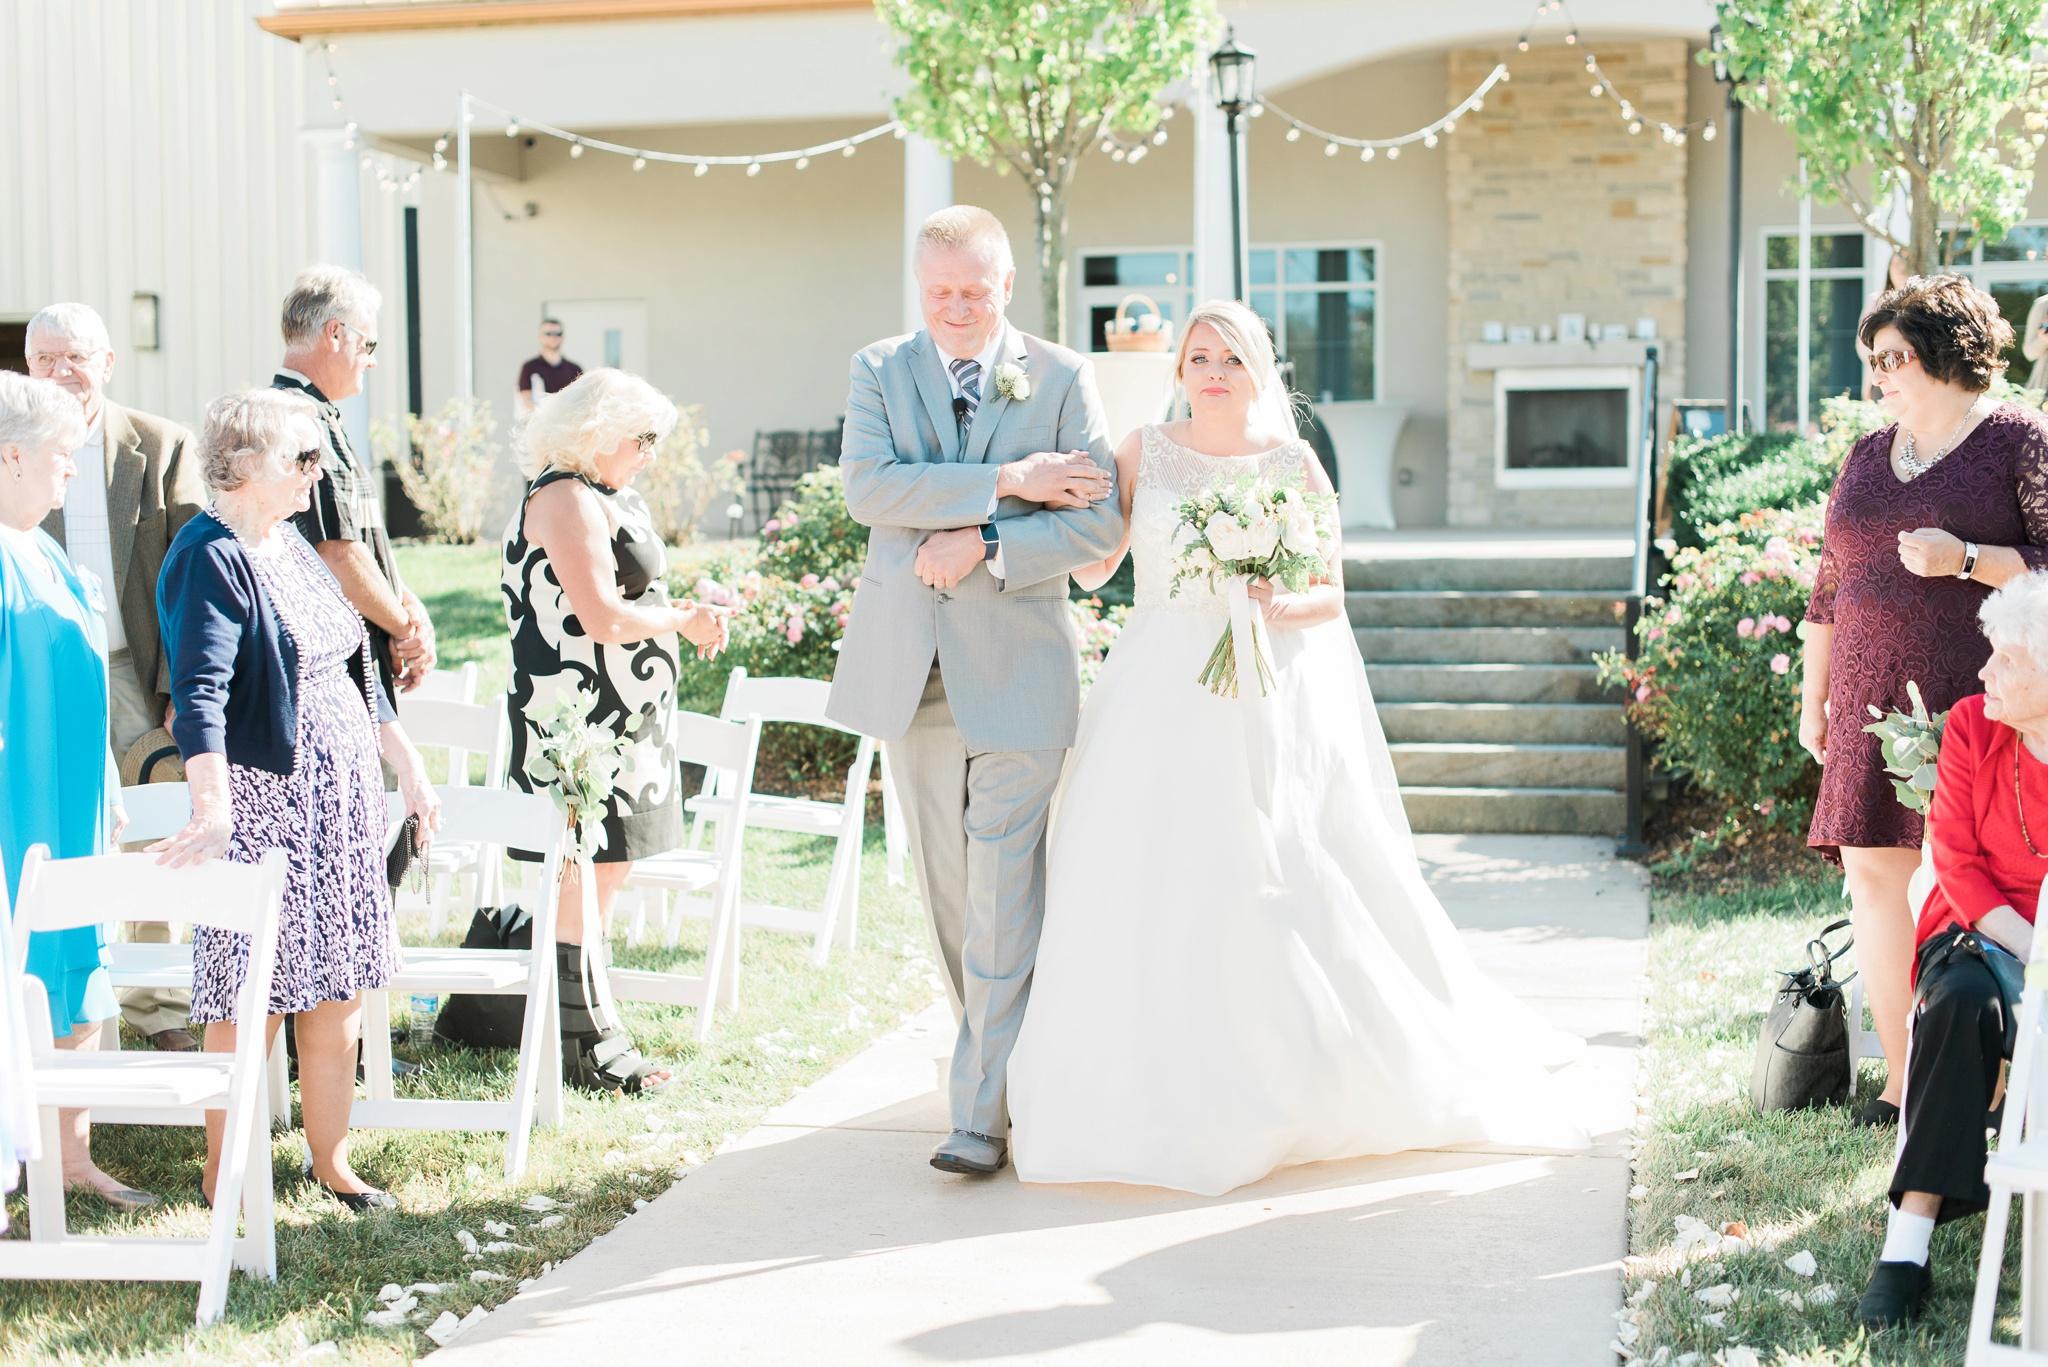 aladdin-shrine-center-wedding-grove-city-ohio-amber-jared_0107.jpg